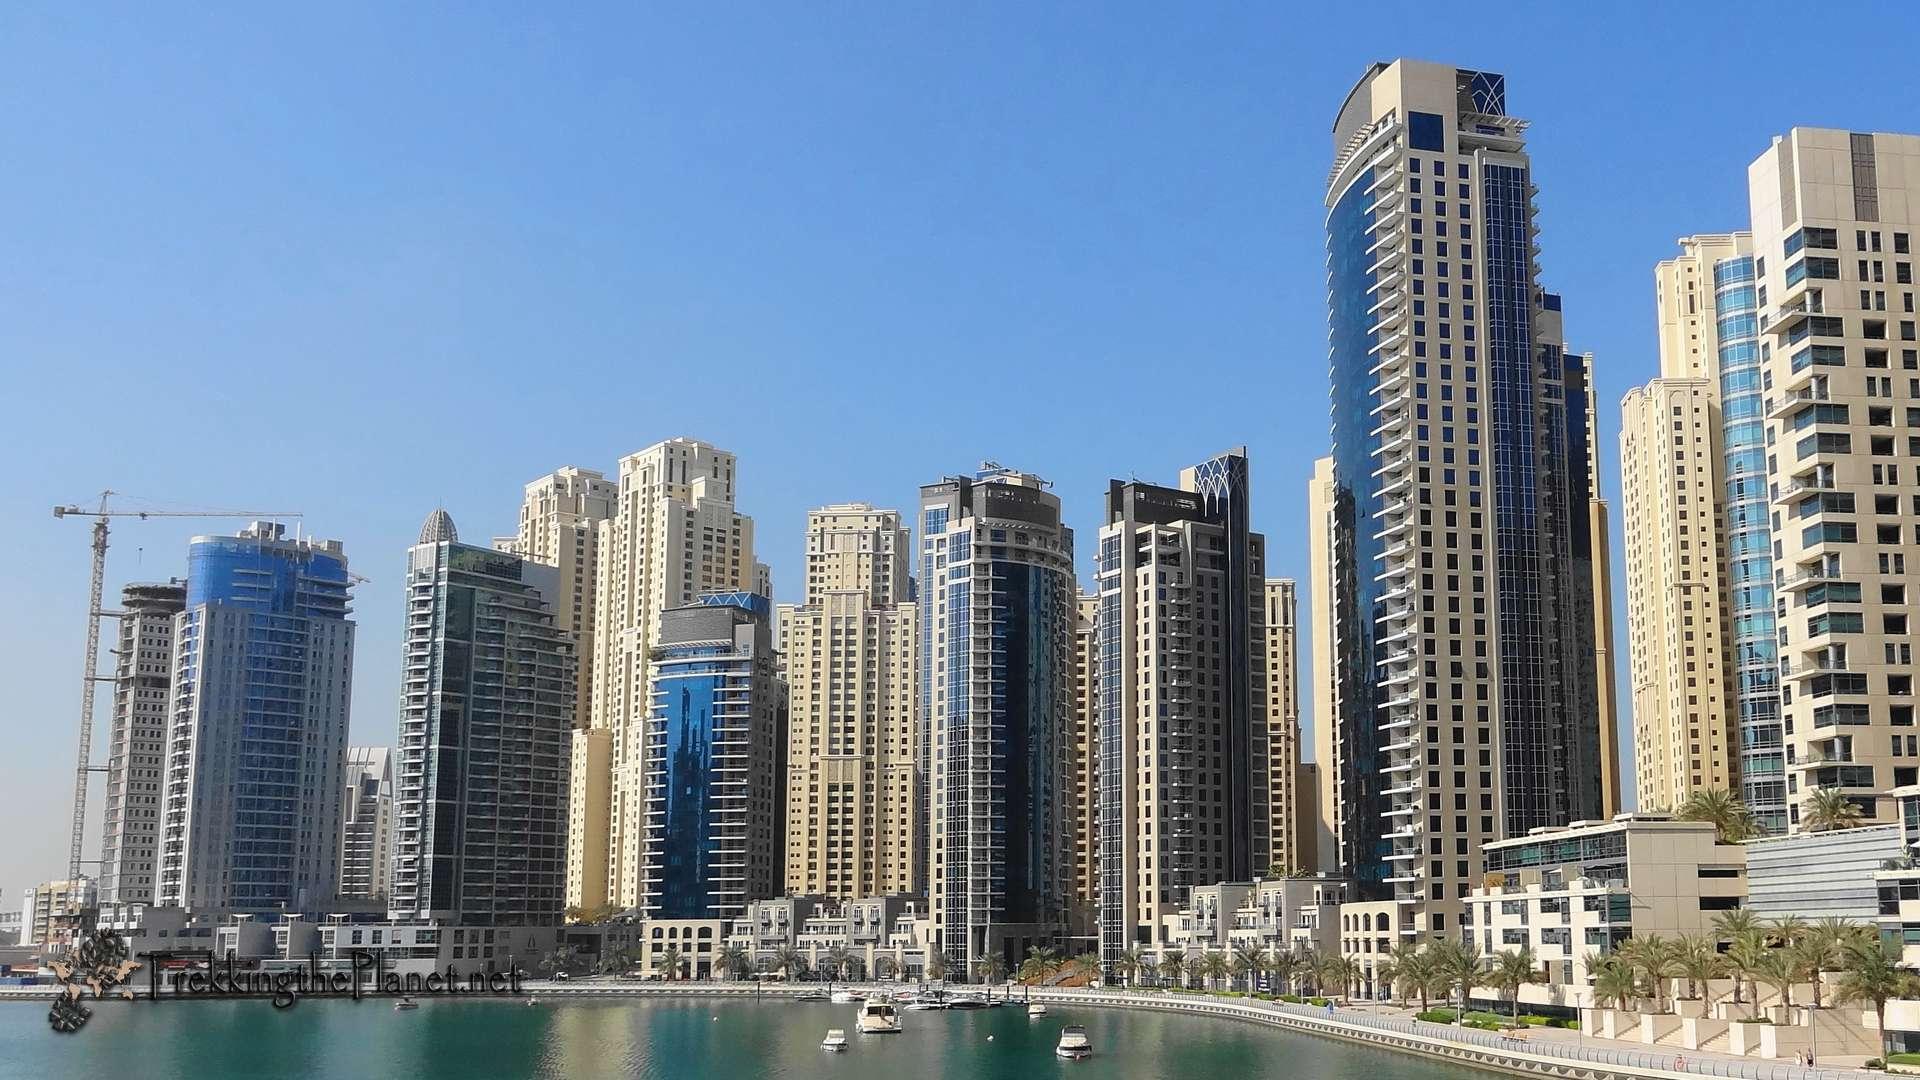 Dubai Marina At Night HD Mobile Wallpaper Vactual Papers